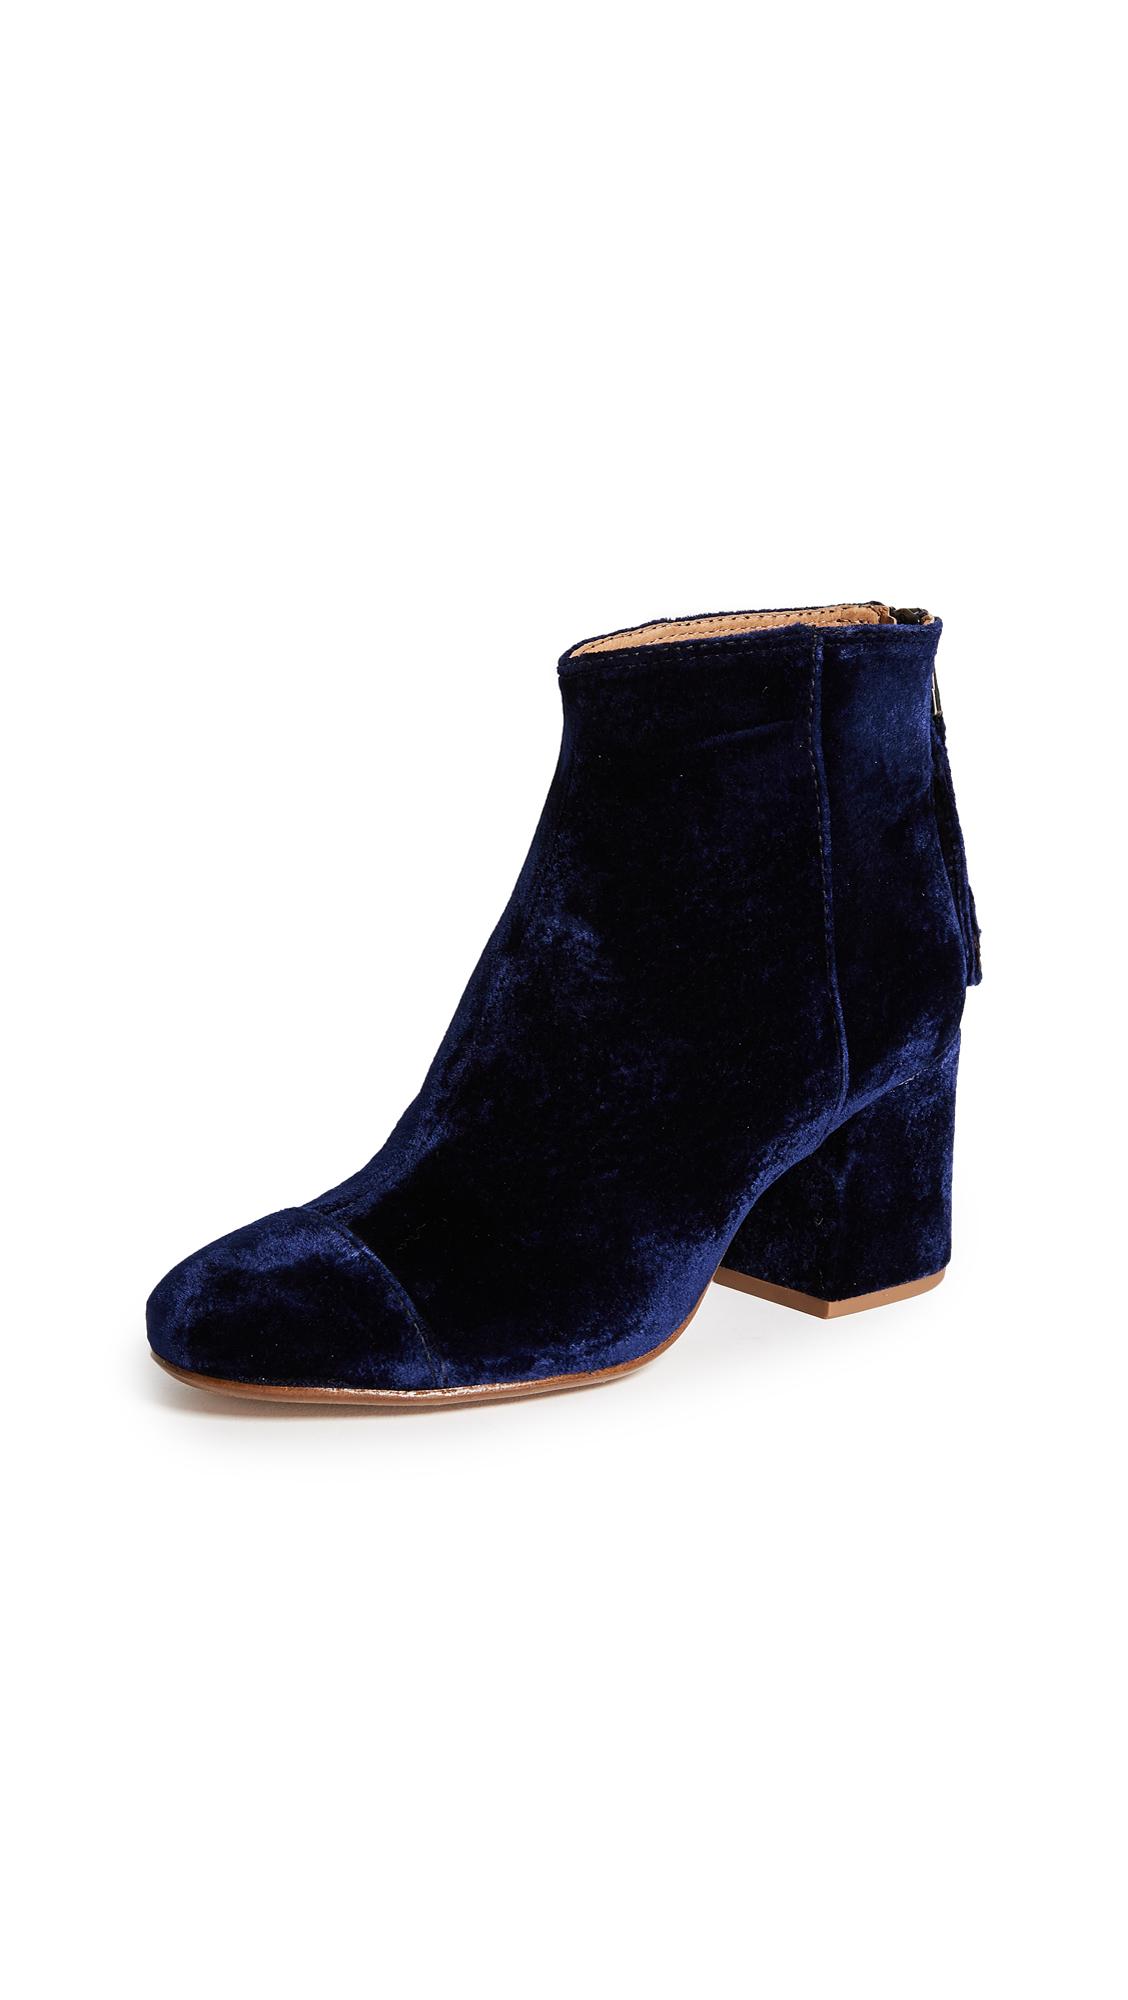 Madewell Glenda Boots - Night Vision